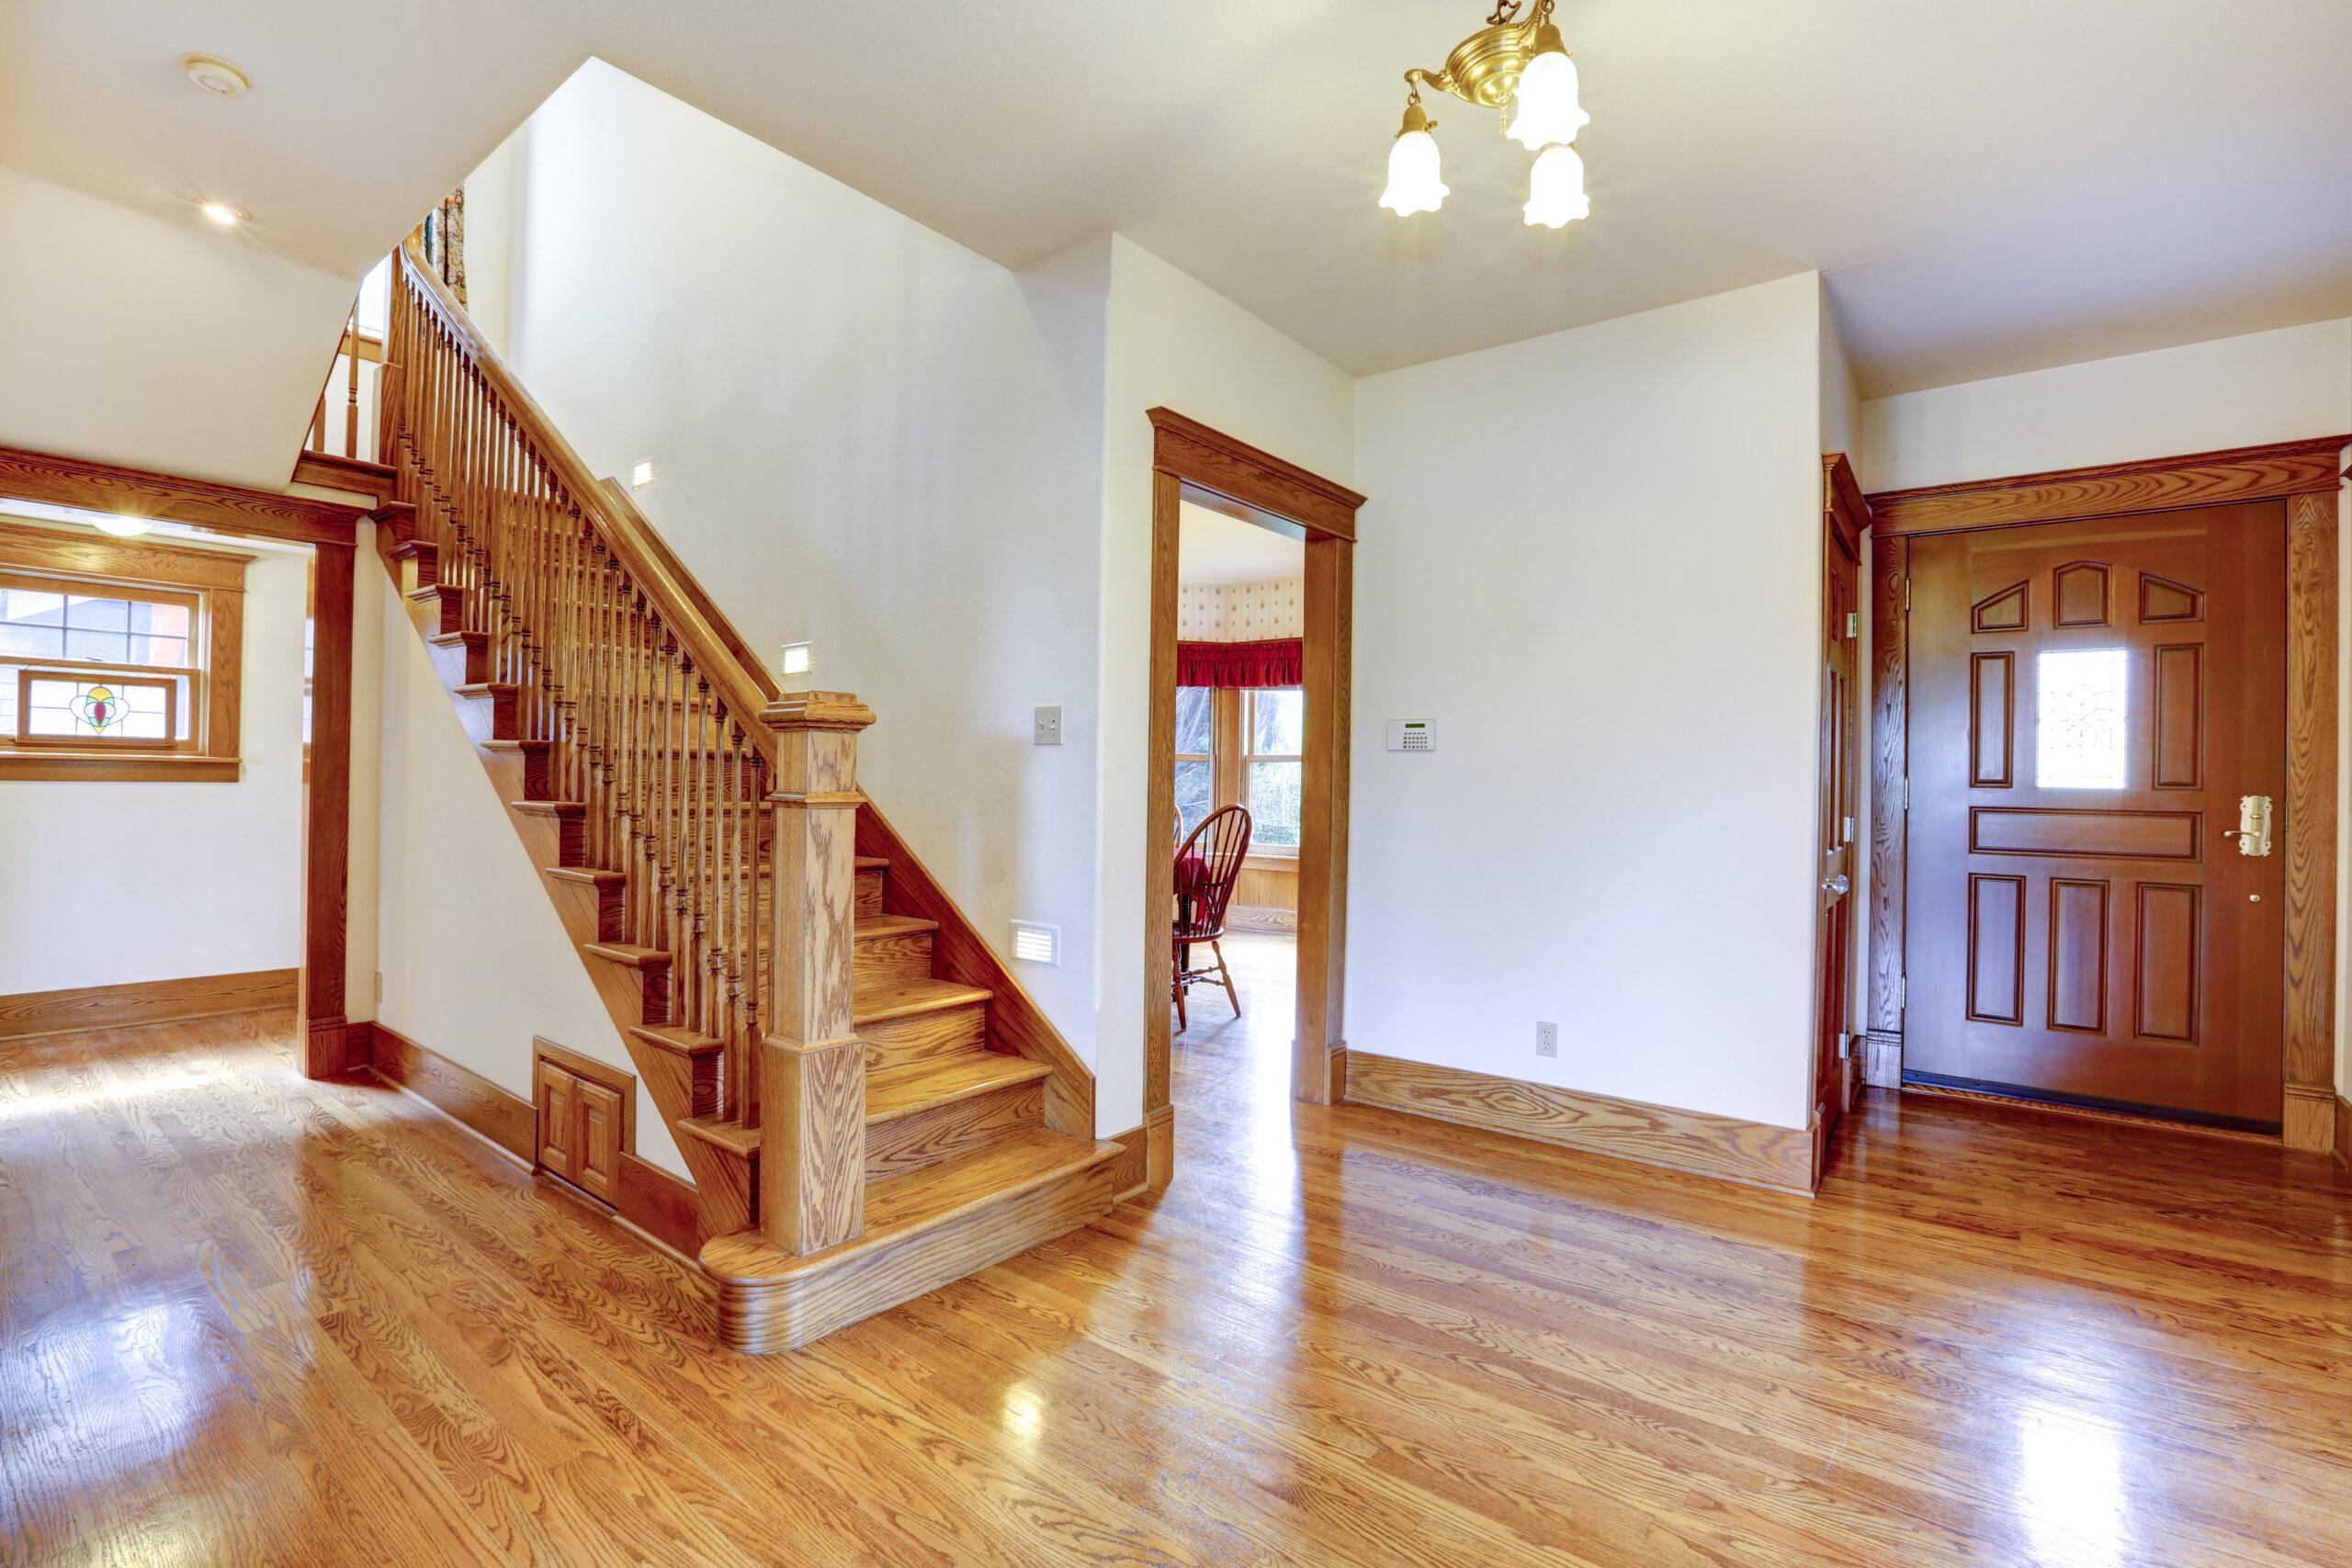 Empty,House,Interior.,Entrance,Hallway,With,New,Shiny,Hardwood,Floor